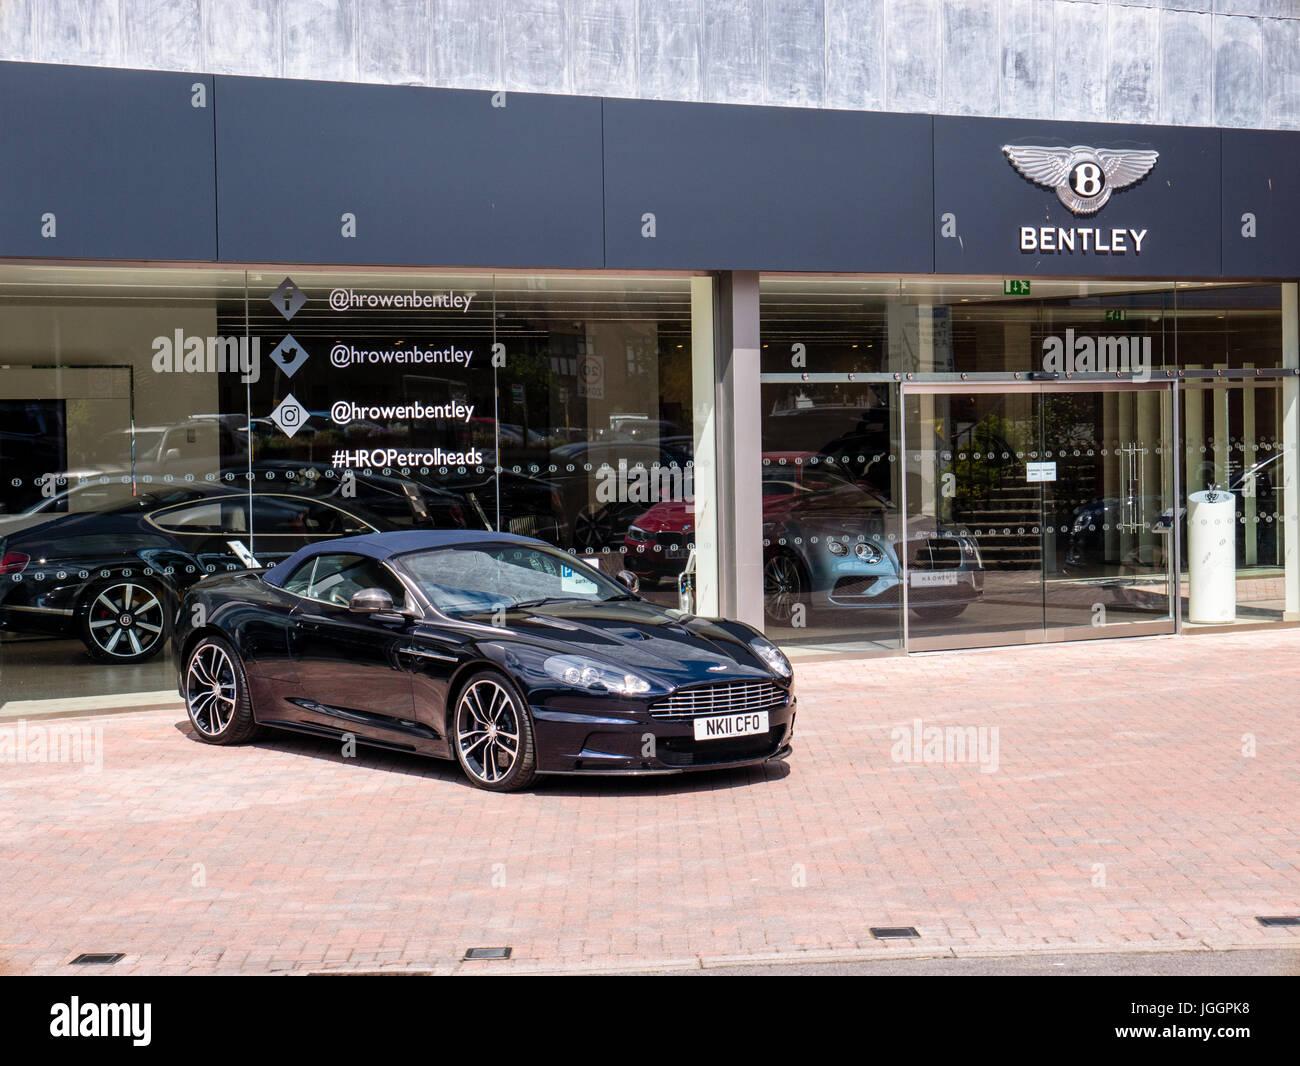 Luxury Car Dealership Dealing With Bentley Aston Martin Stock Photo Alamy